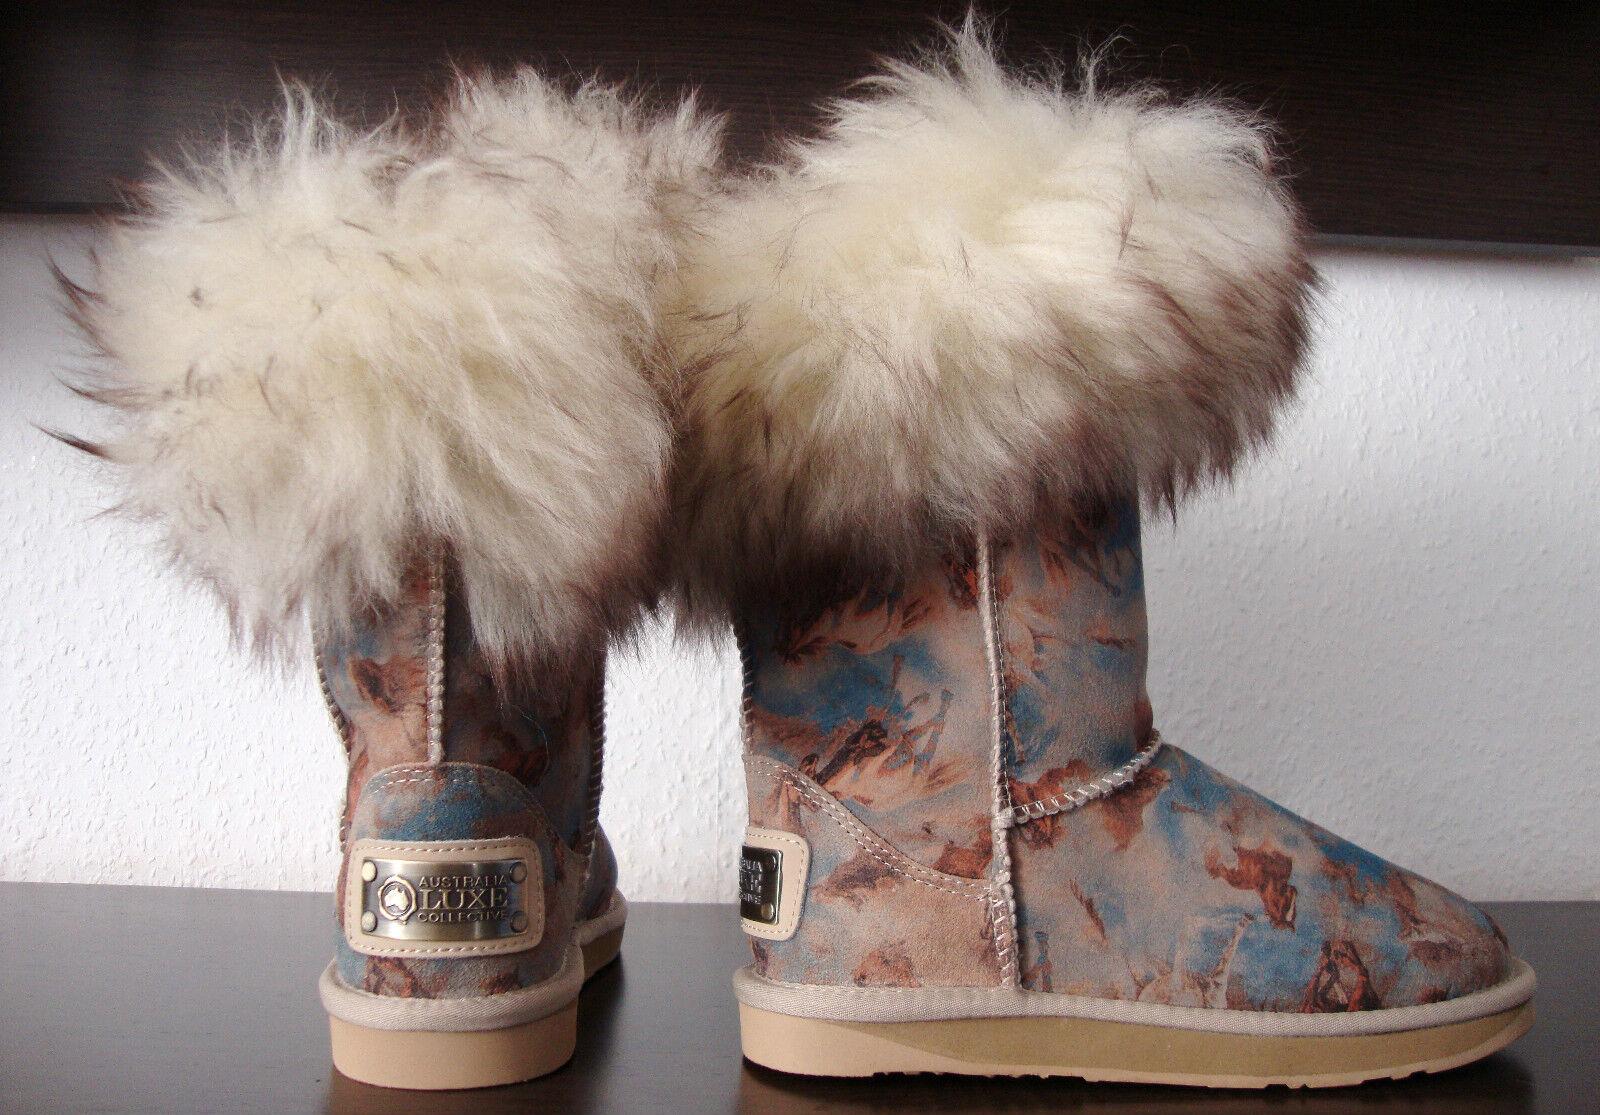 AUSTRALIA LUXE FOXY SHORT Stiefel Pelz Damen Stiefel Leder Schuhe Gr.37 NEU